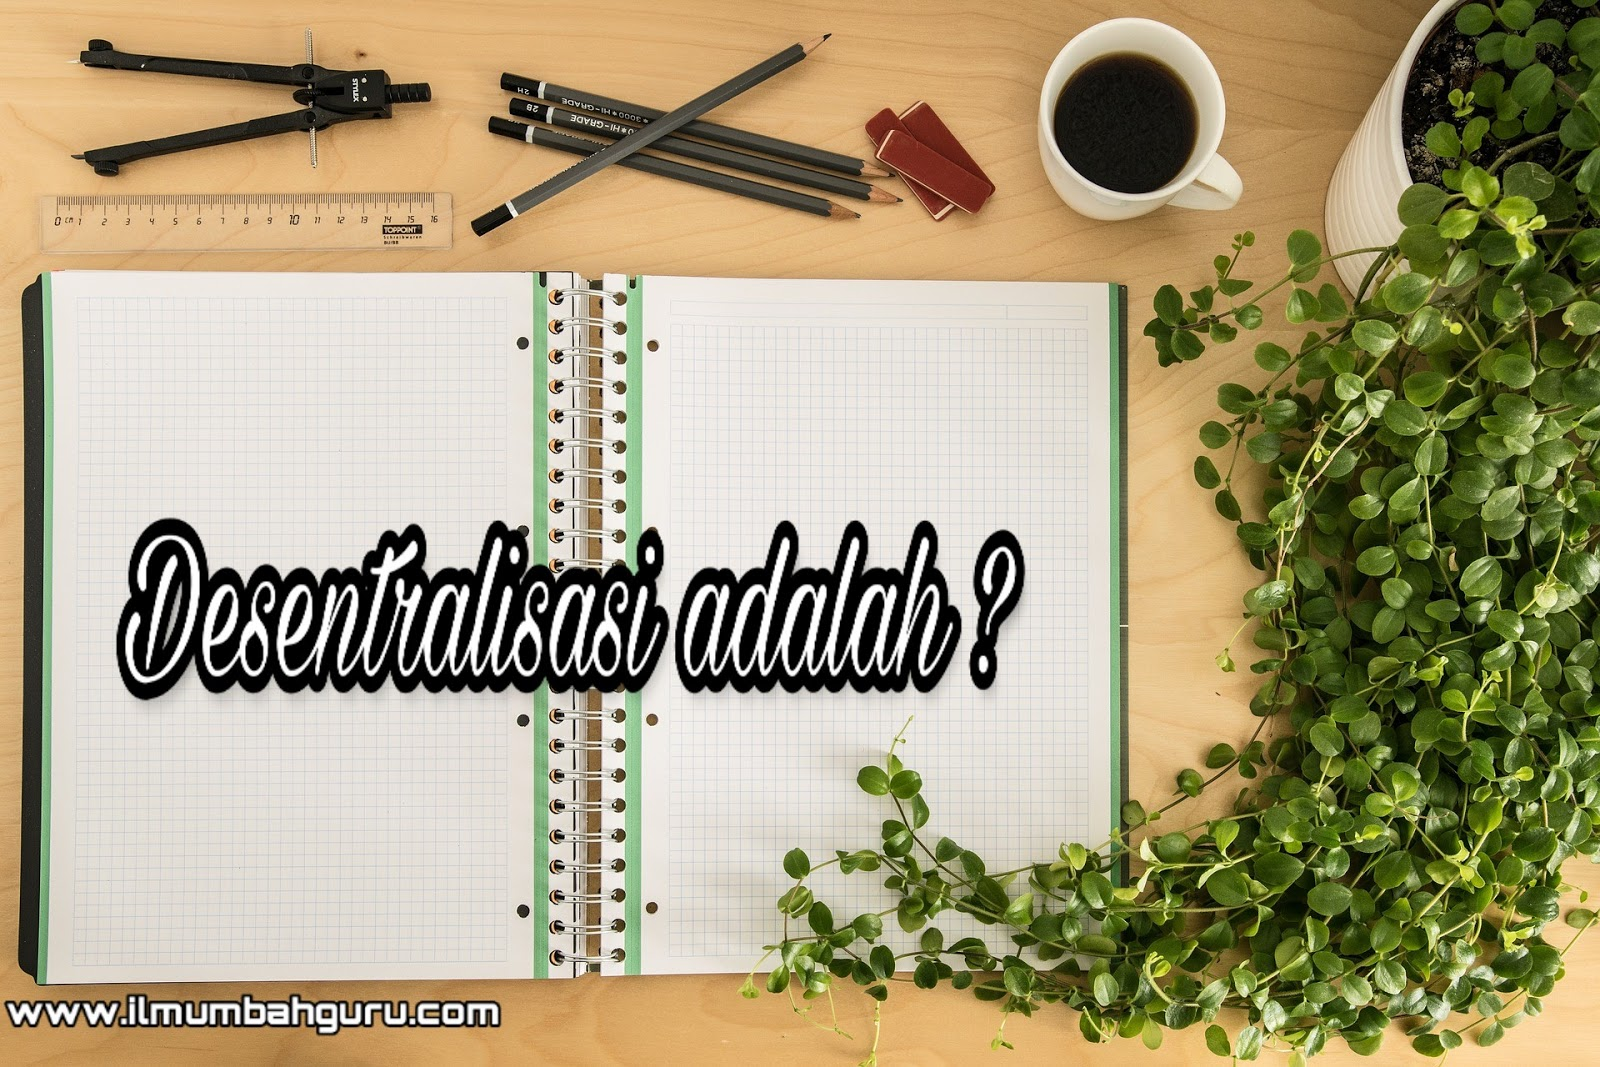 desentralisasi adalah contoh, ciri dan pengertian secara ...